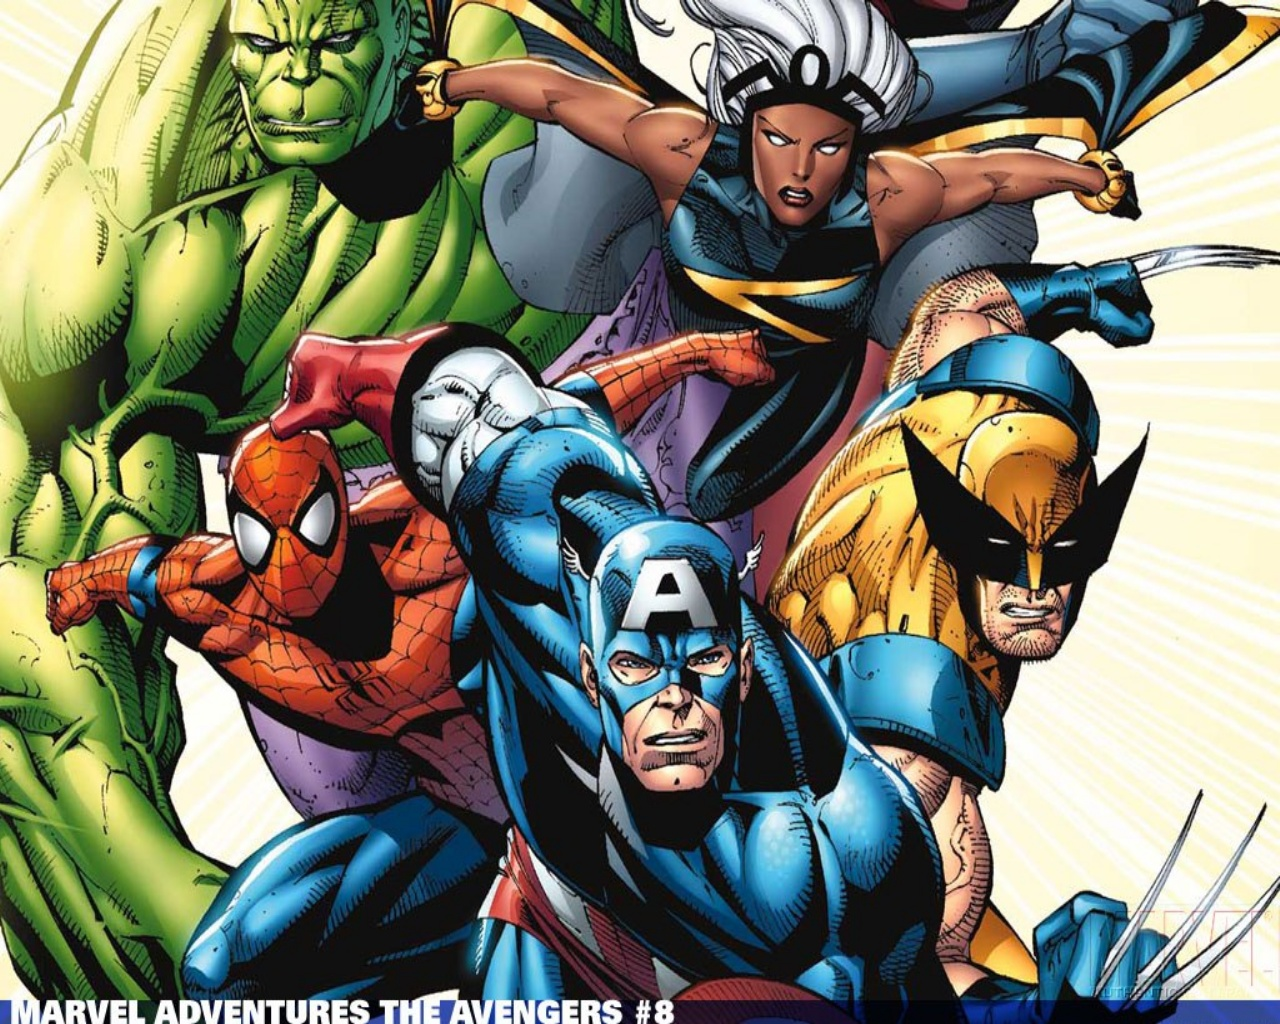 dessin en couleurs imprimer personnages clbres comics avengers numro 502940 - Dessin Marvel